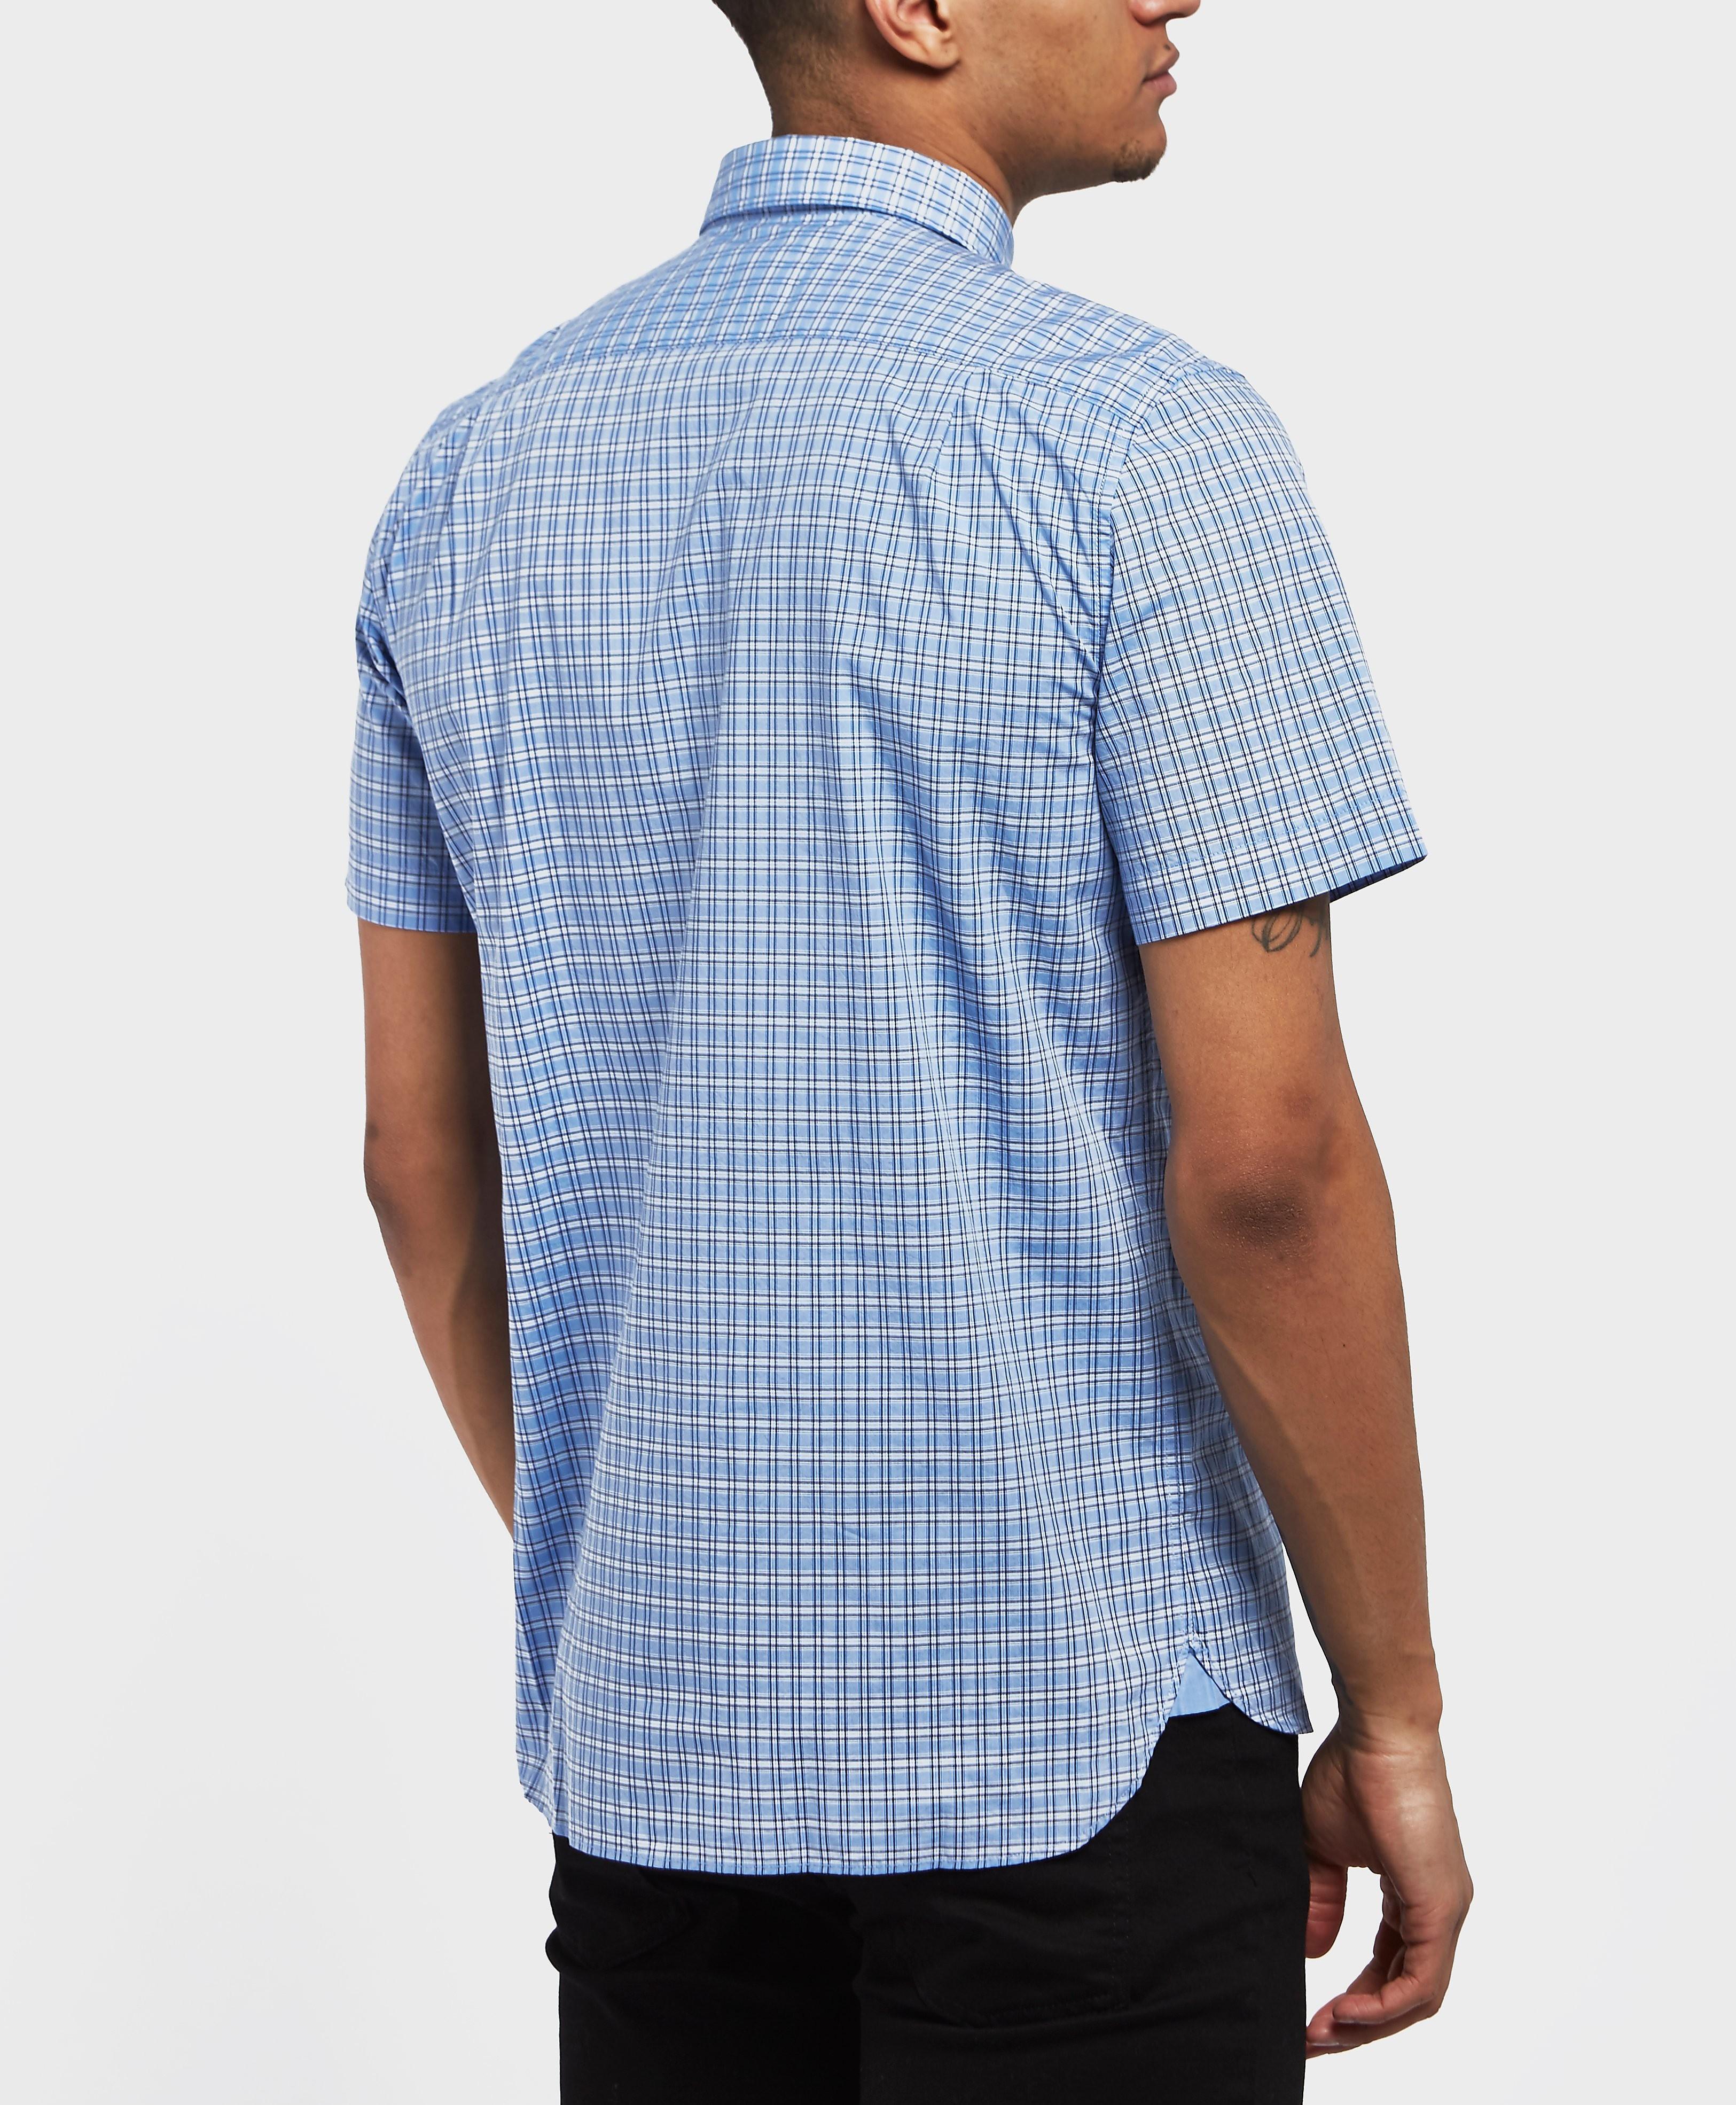 Lacoste Poplin Check Short Sleeve Shirt